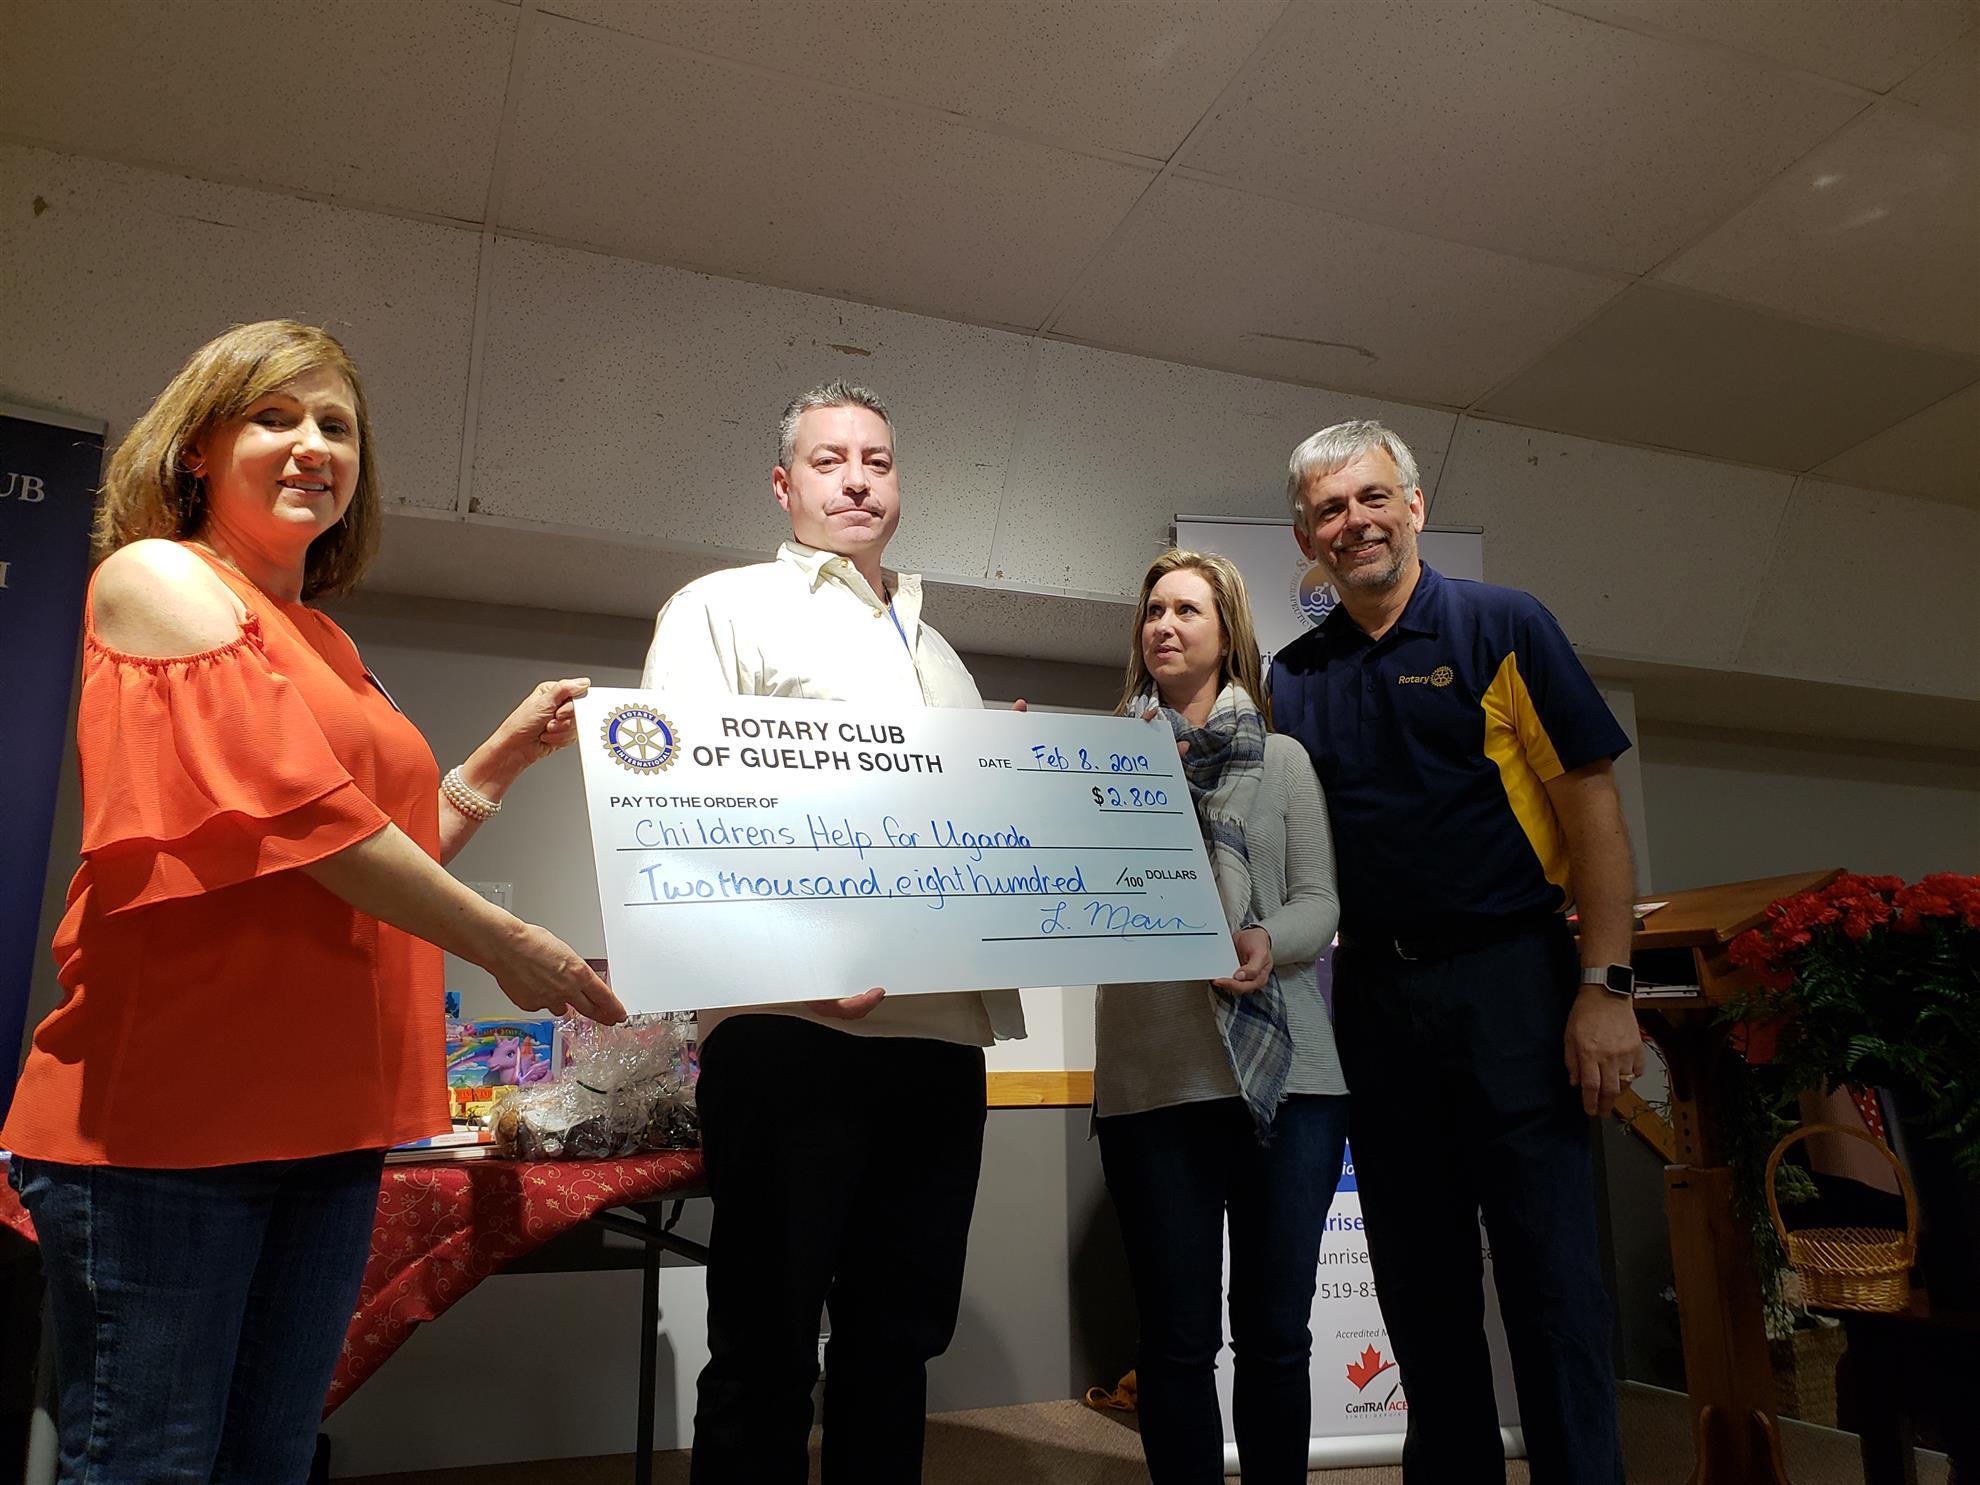 Linda + Brian presenting a $2800 donation to Dennis + Stephanie Devey of Childrens Help for Uganda